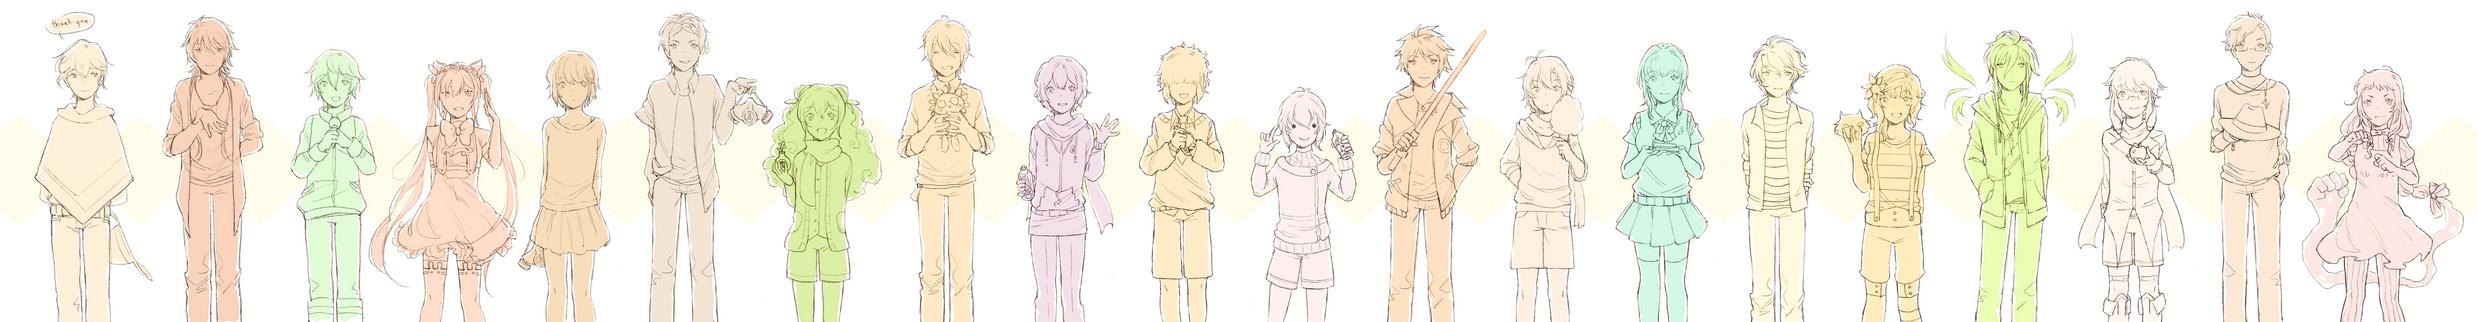 mage: happy 3rd anniversary by kiramemo